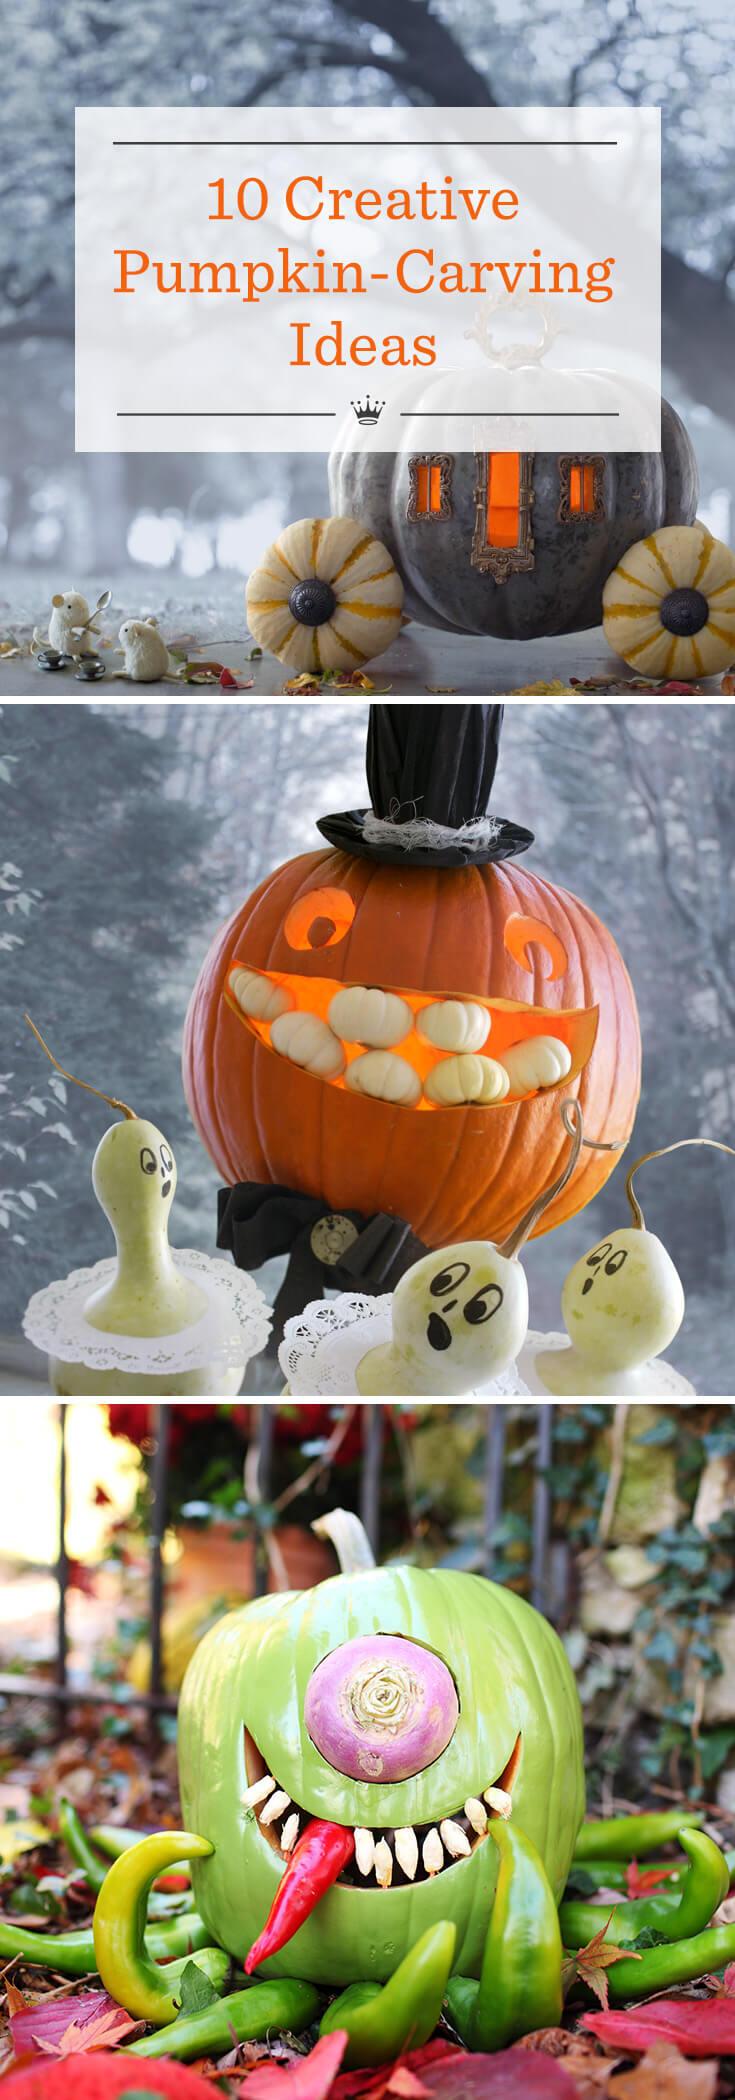 10 creative pumpkin carving ideas | hallmark ideas & inspiration